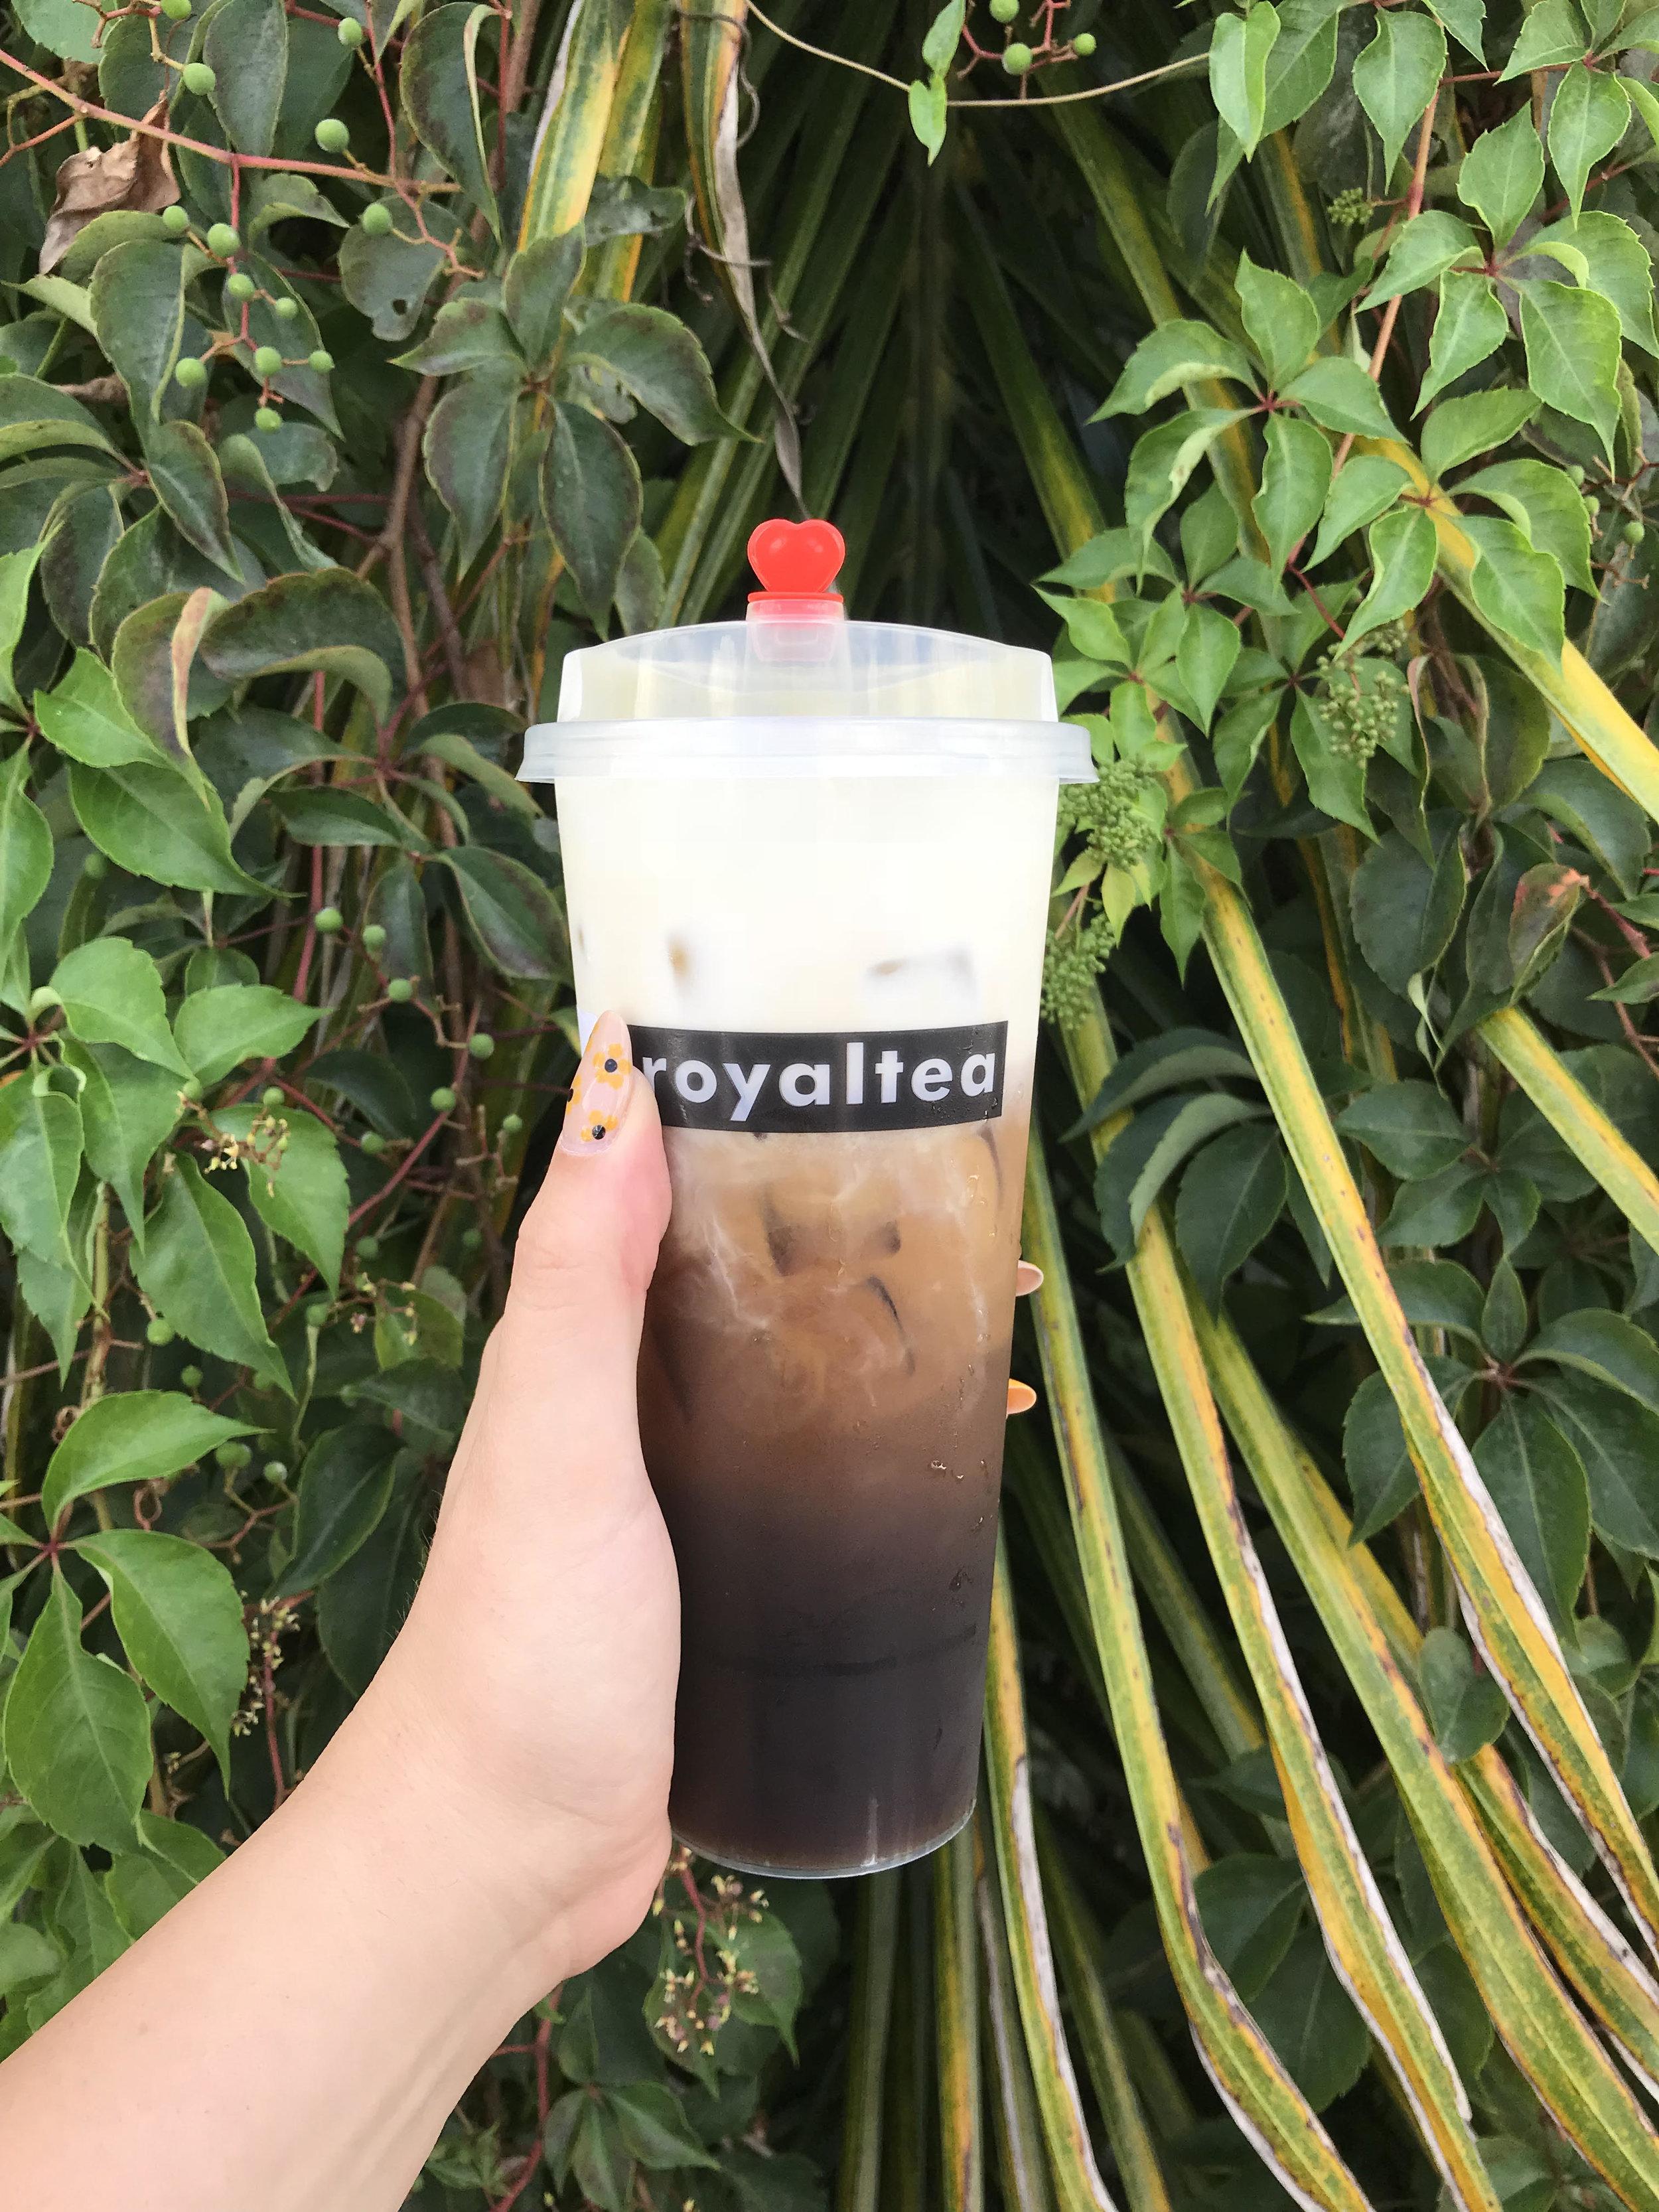 royalteacoffee.jpg